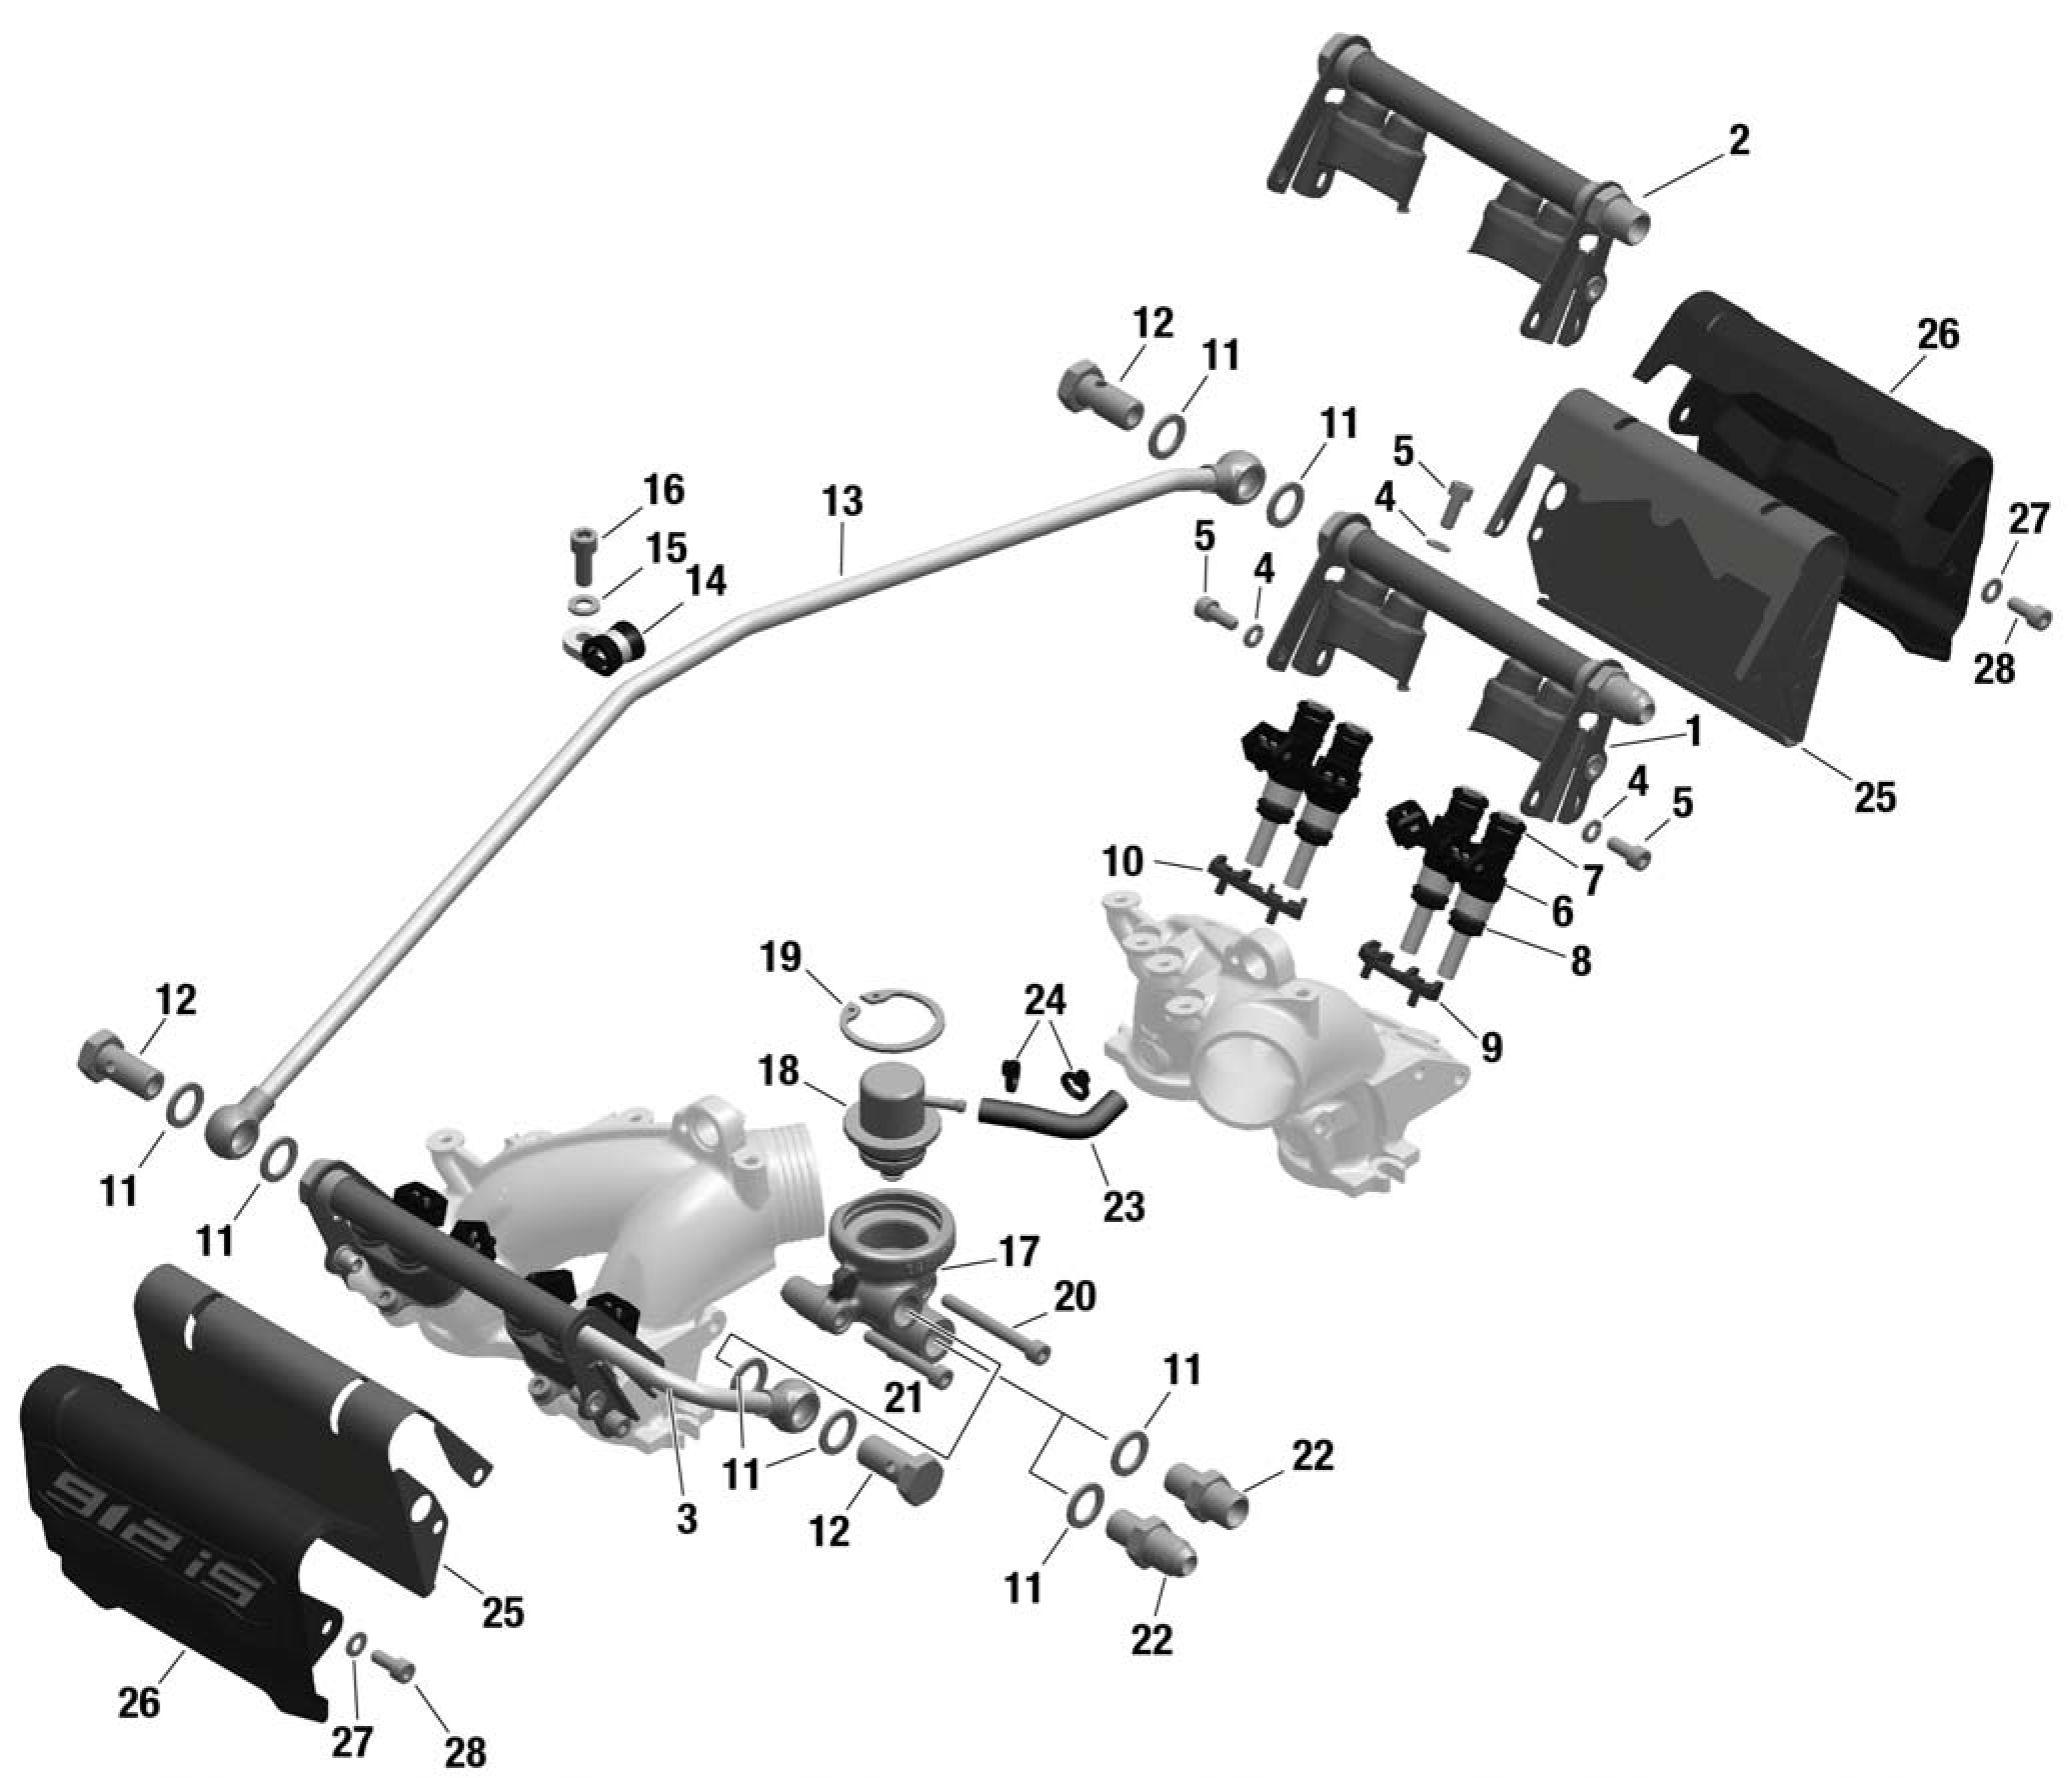 912 iS Fuel Injector, Fuel Rail, Pressure Regulator, Fuel Rail Cover